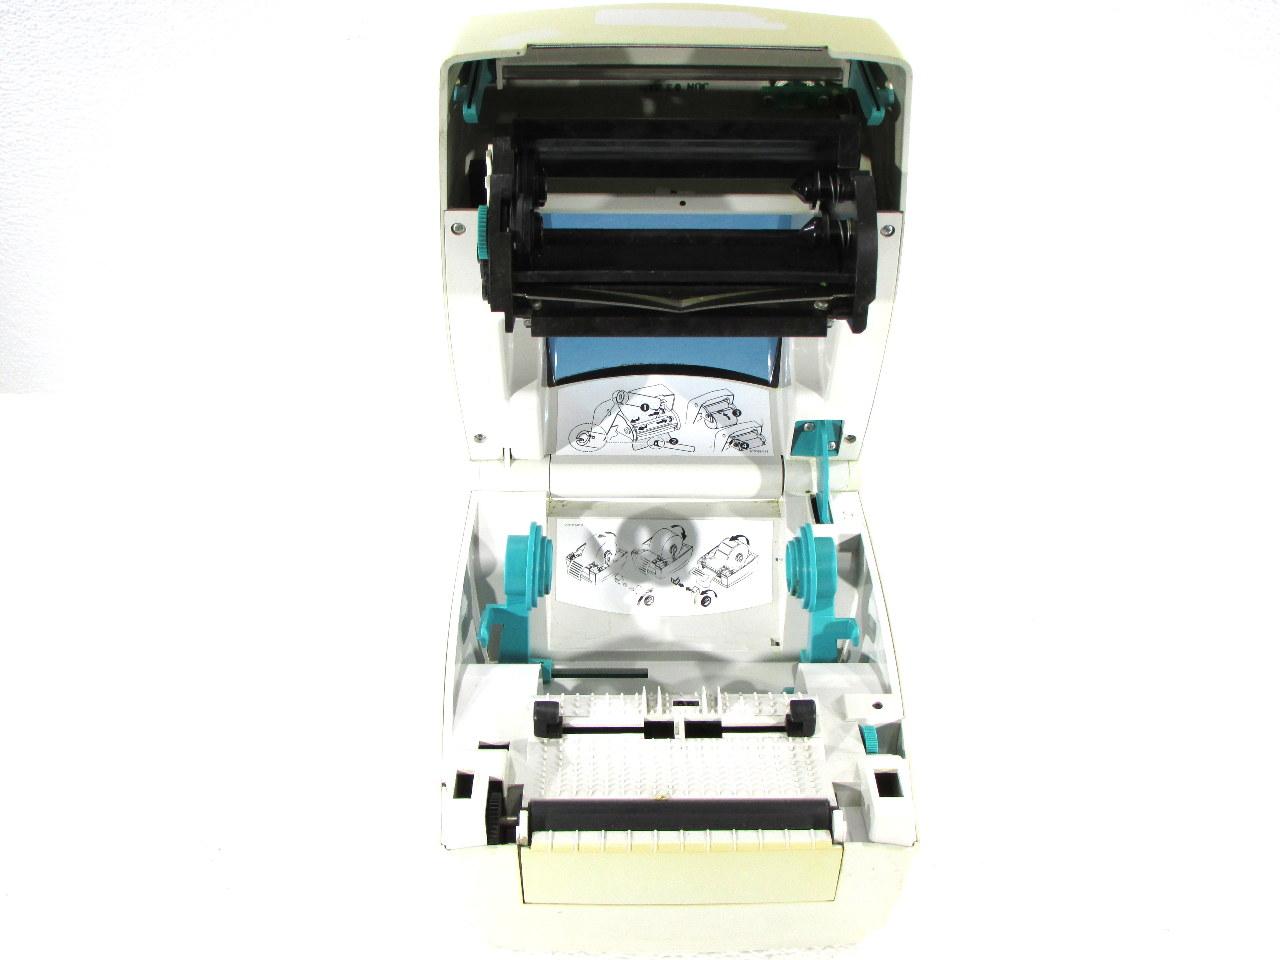 Zebra lp 2844 thermal label printer / Big lots shawnee ok